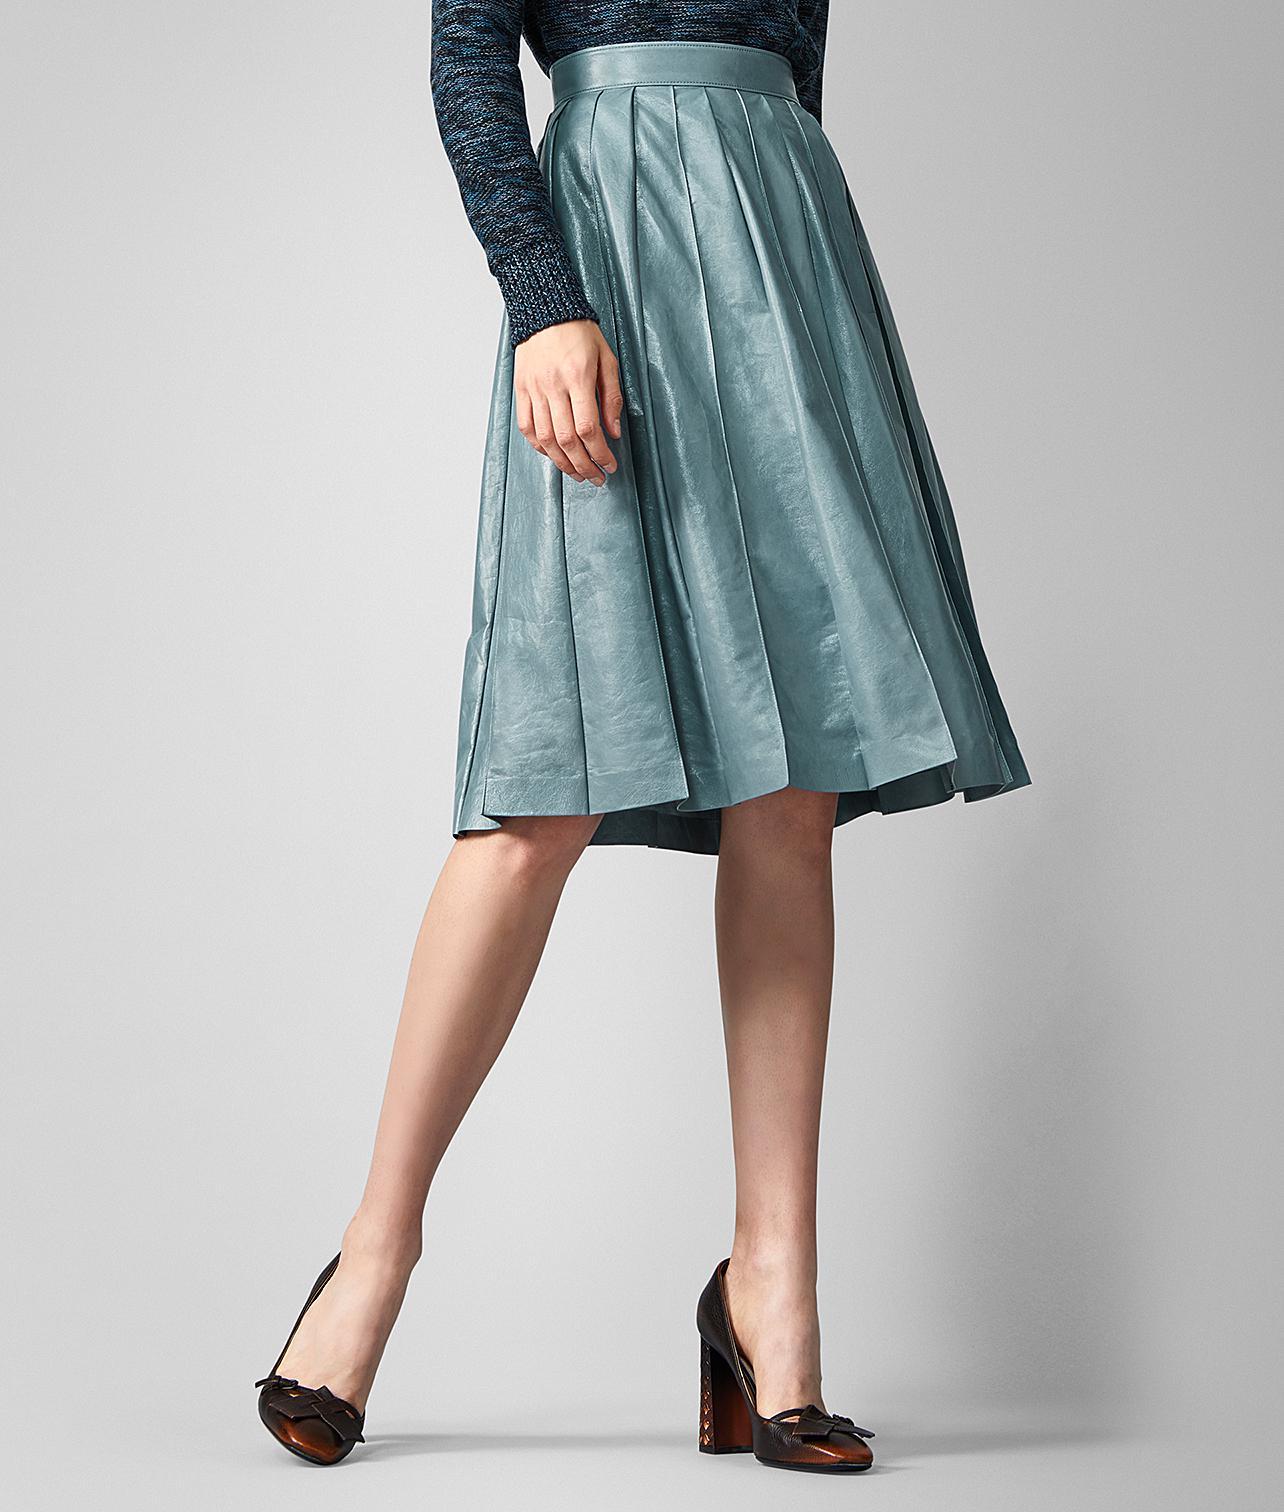 19a8d71829 Bottega Veneta Skirt In Lamb in Blue - Lyst